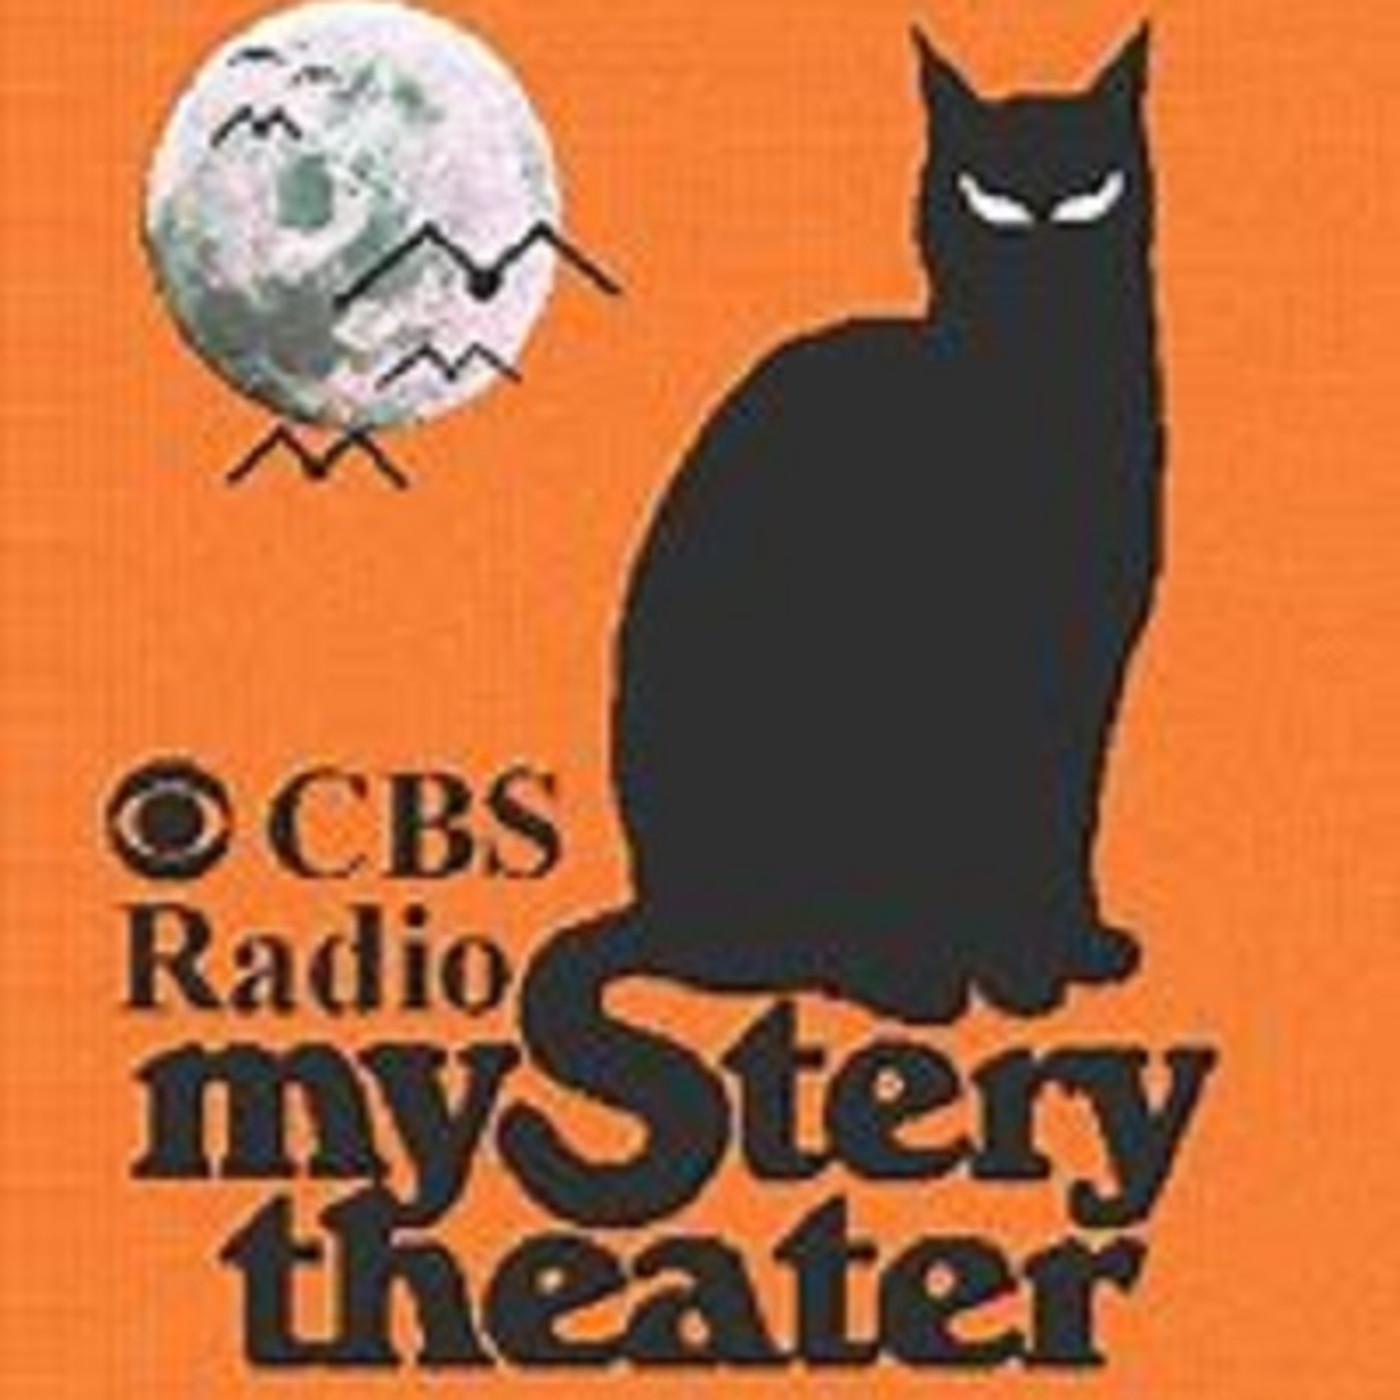 CBS Radio Mystery Theater_79-09-24_(1015)_The Gettysburg Address